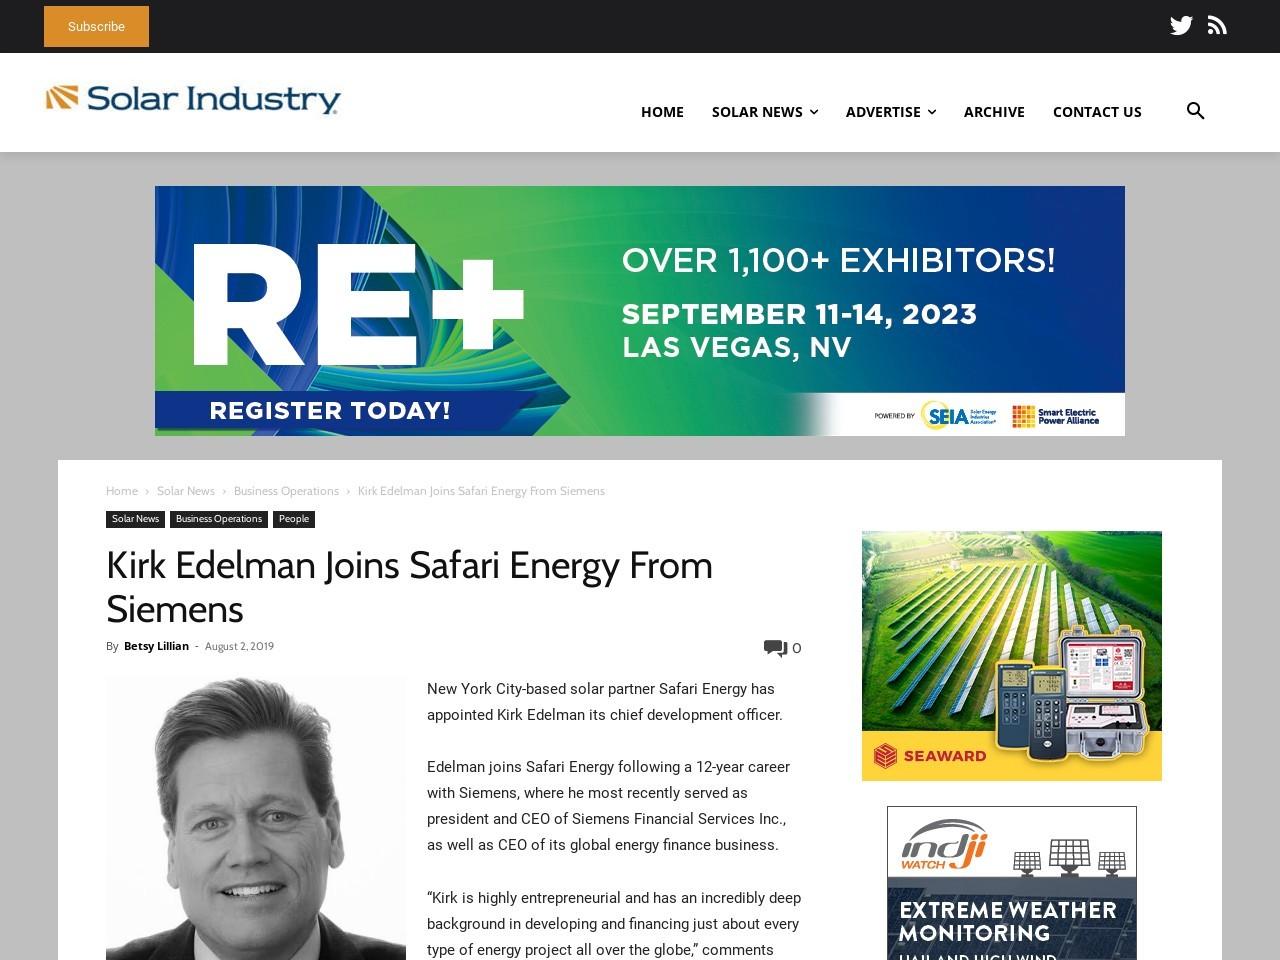 Kirk Edelman Joins Safari Energy From Siemens